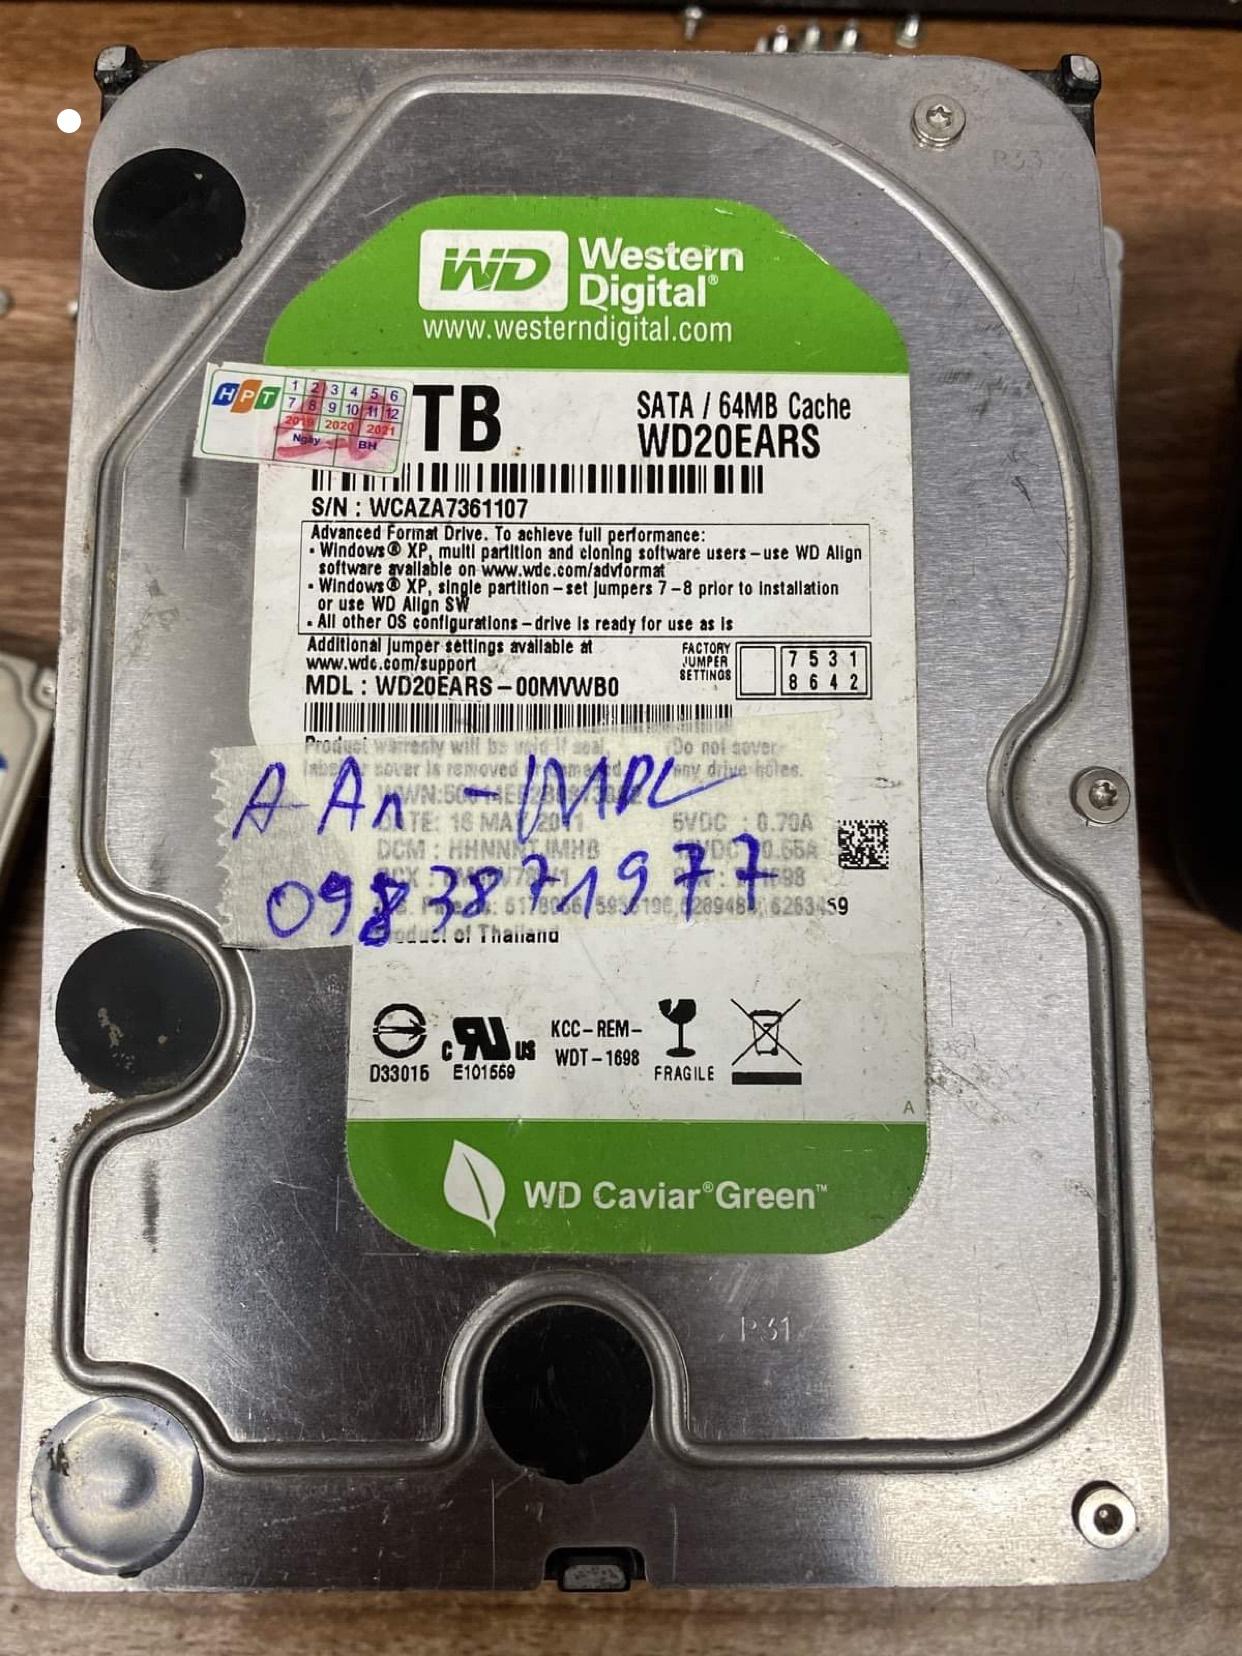 Phục hồi dữ liệu ổ cứng Western 10TB mất dữ liệu 23/06/2020 - cuumaytinh